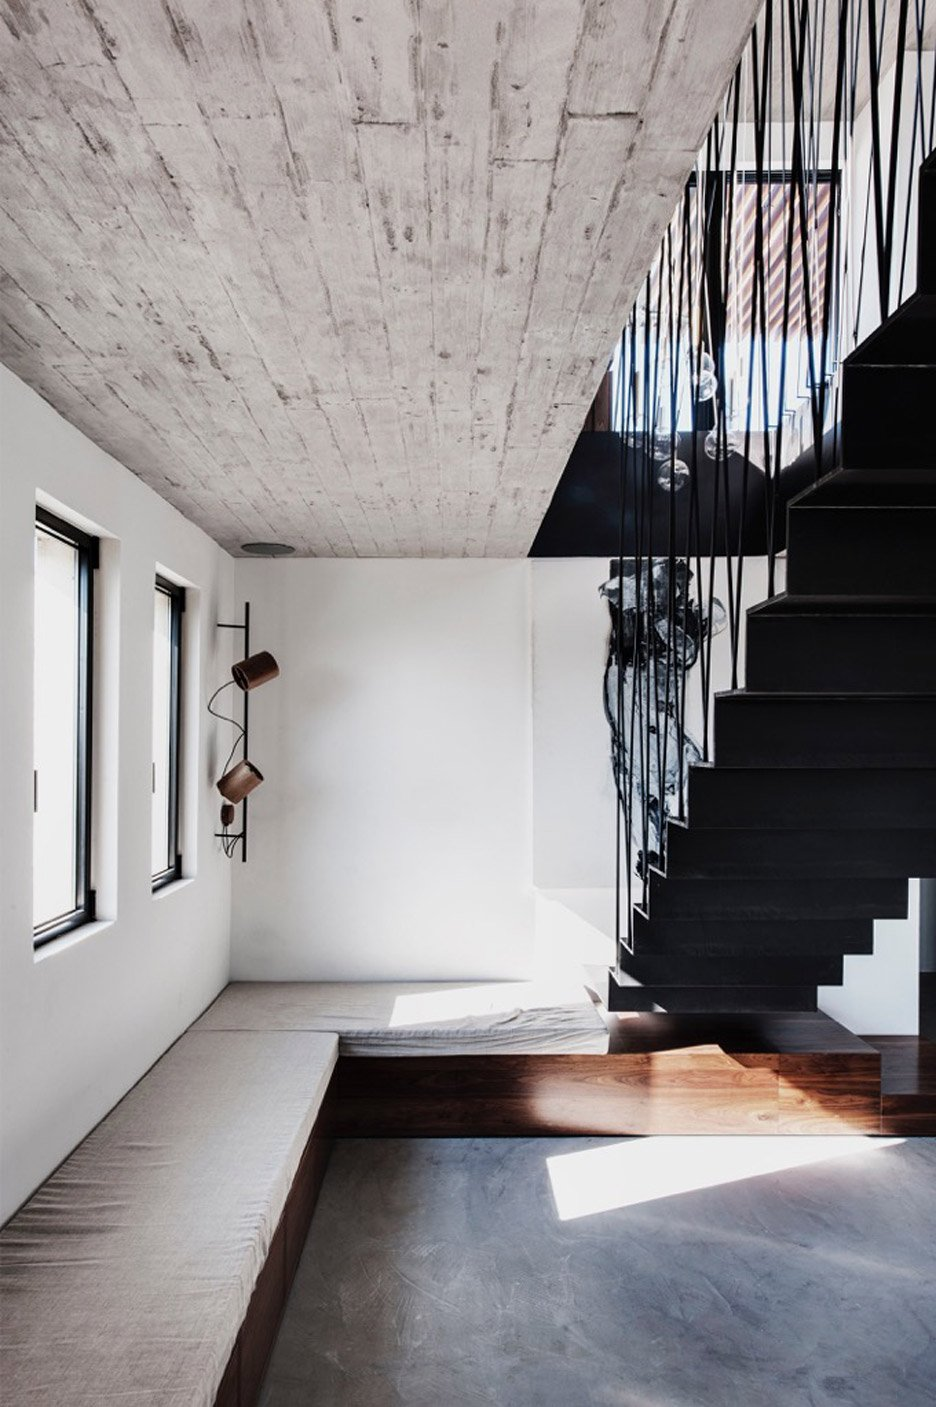 tel-aviv-house-gabrielle-toledano-interior-design_dezeen_936_3